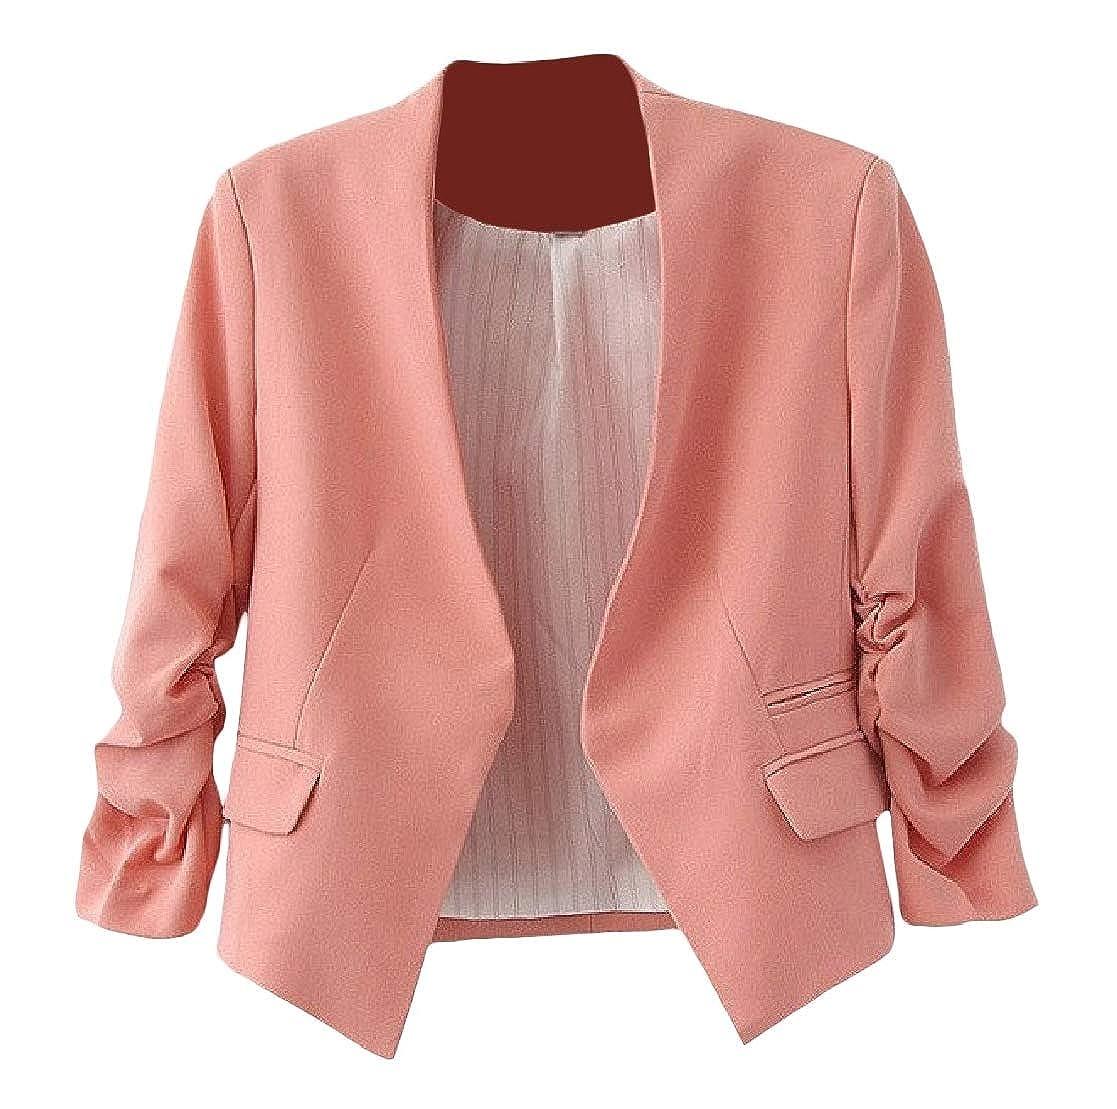 YUNY Women Solid Bishop Sleeve Slim Short Mini Stylish Blazer Outwear Pink M